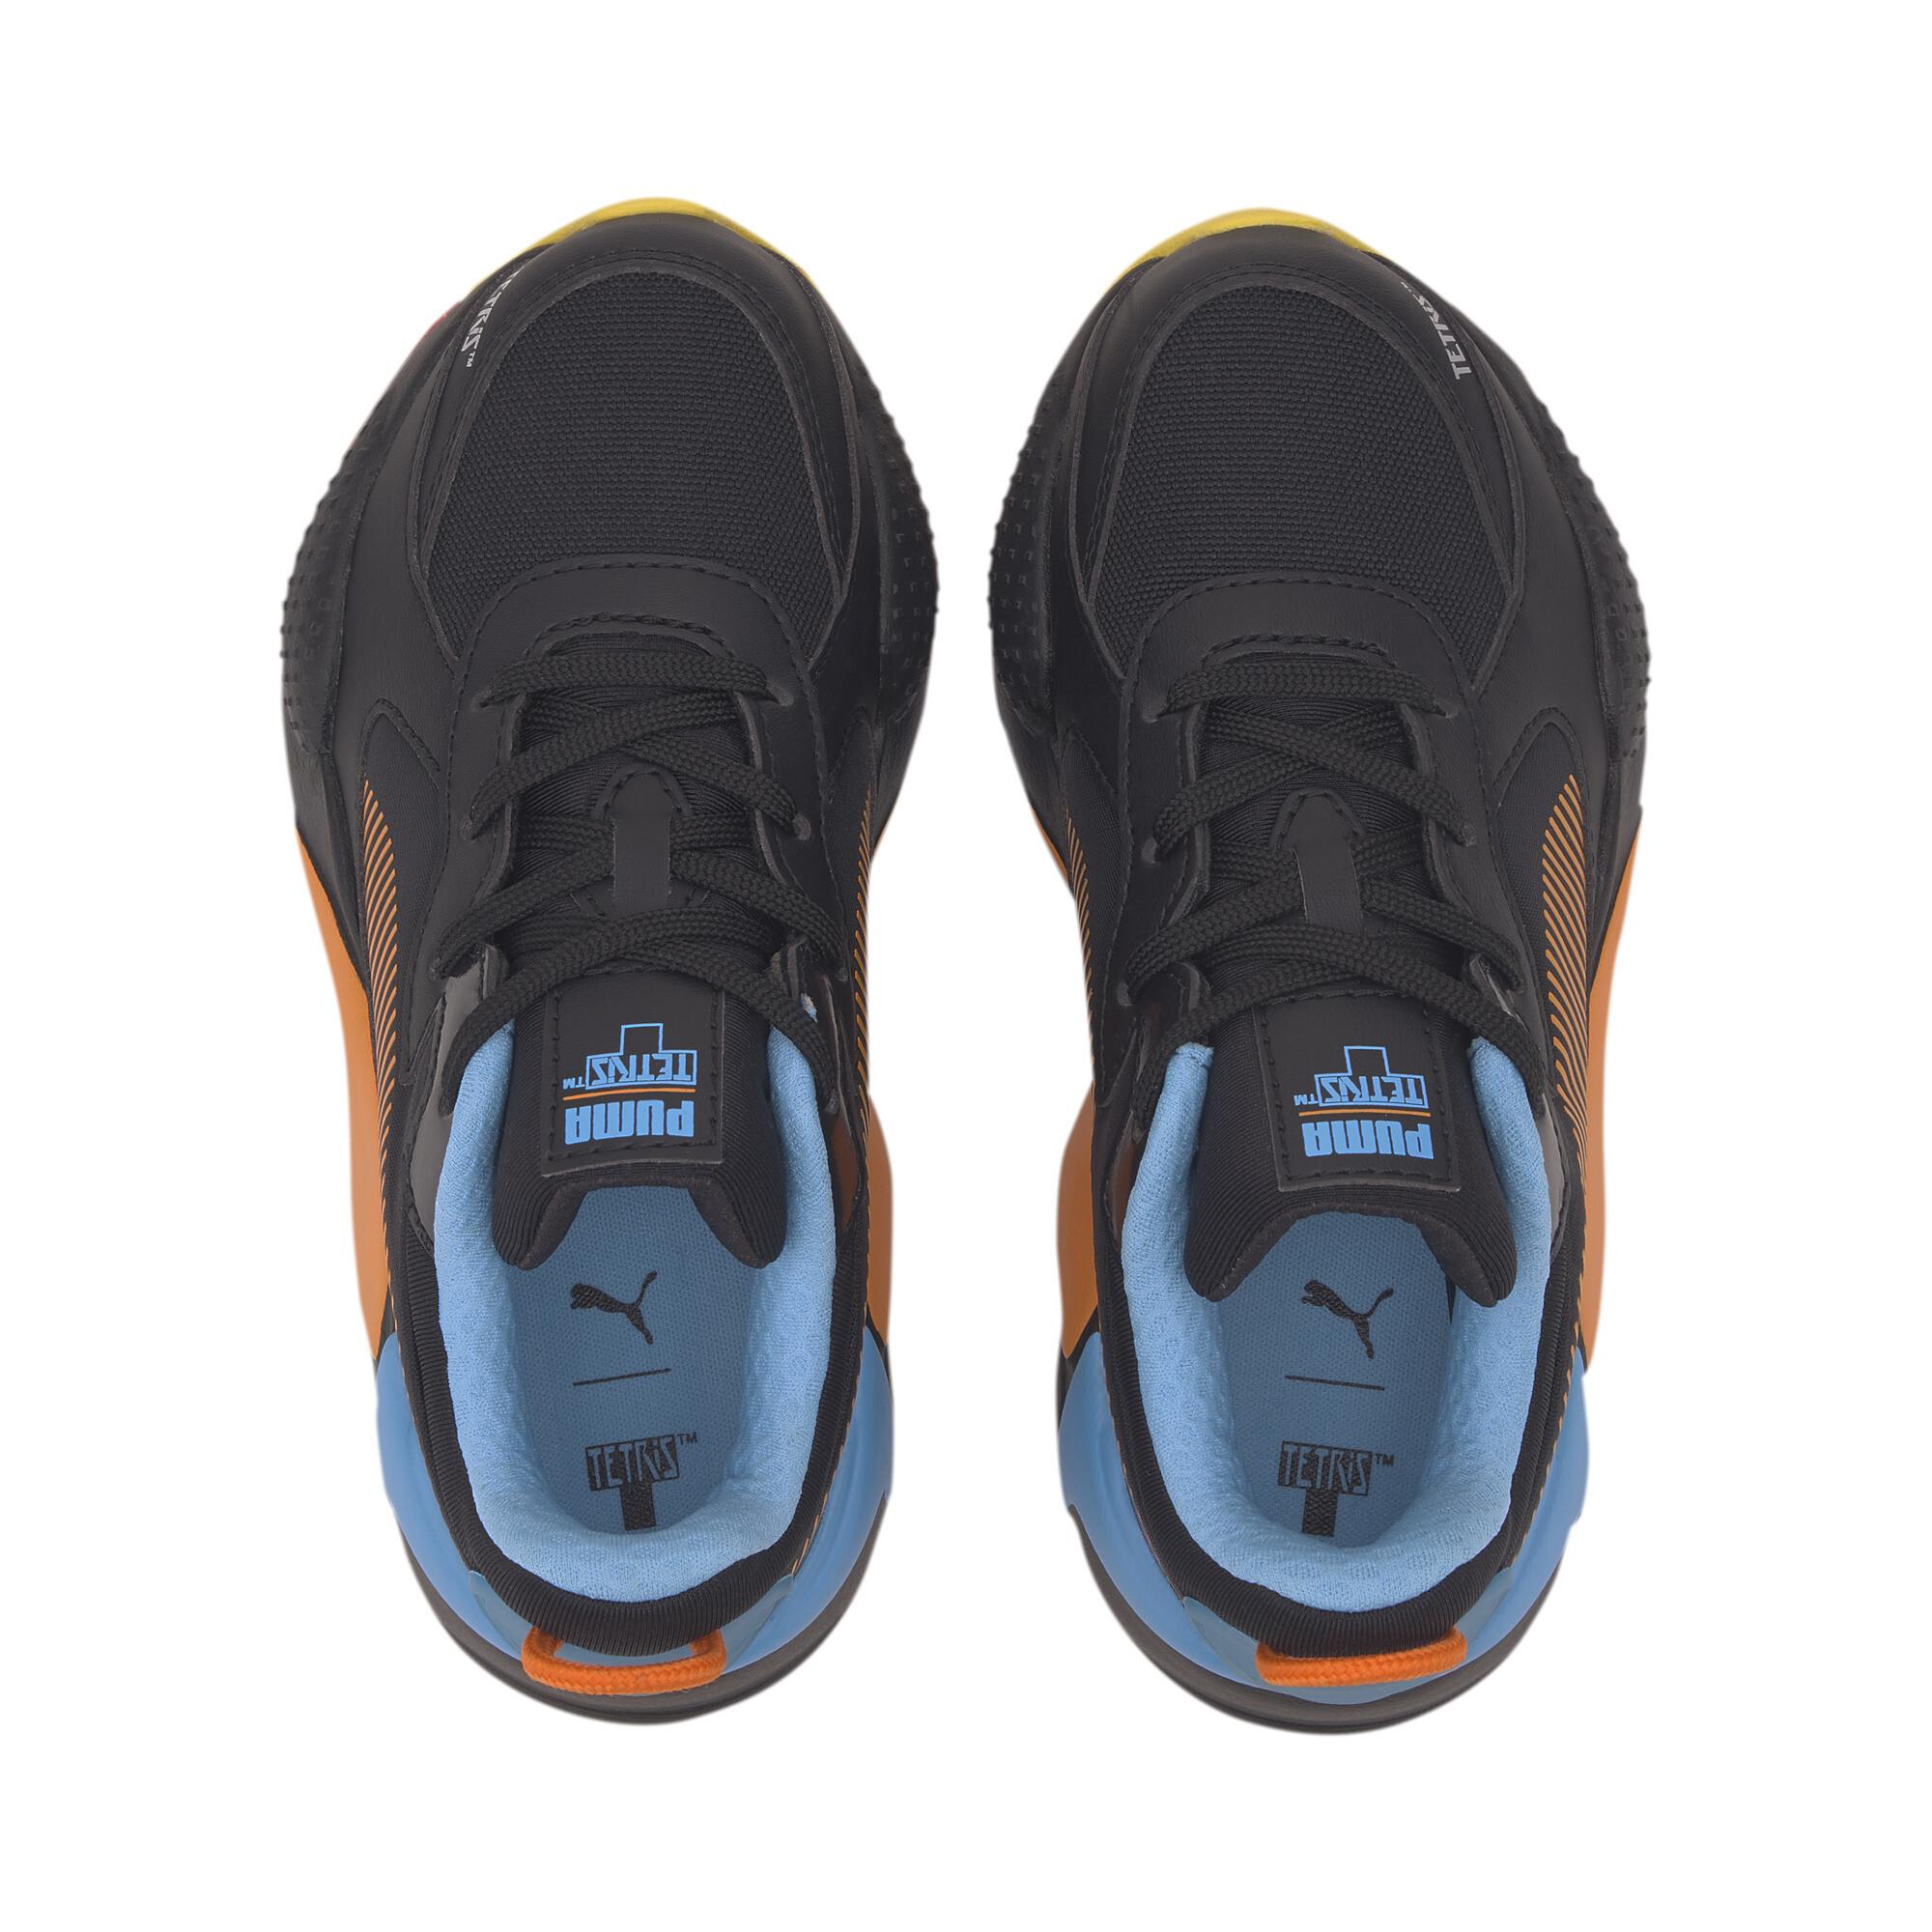 PUMA-PUMA-x-TETRIS-RS-X-Little-Kids-039-Shoes-Kids-Shoe-Kids thumbnail 7